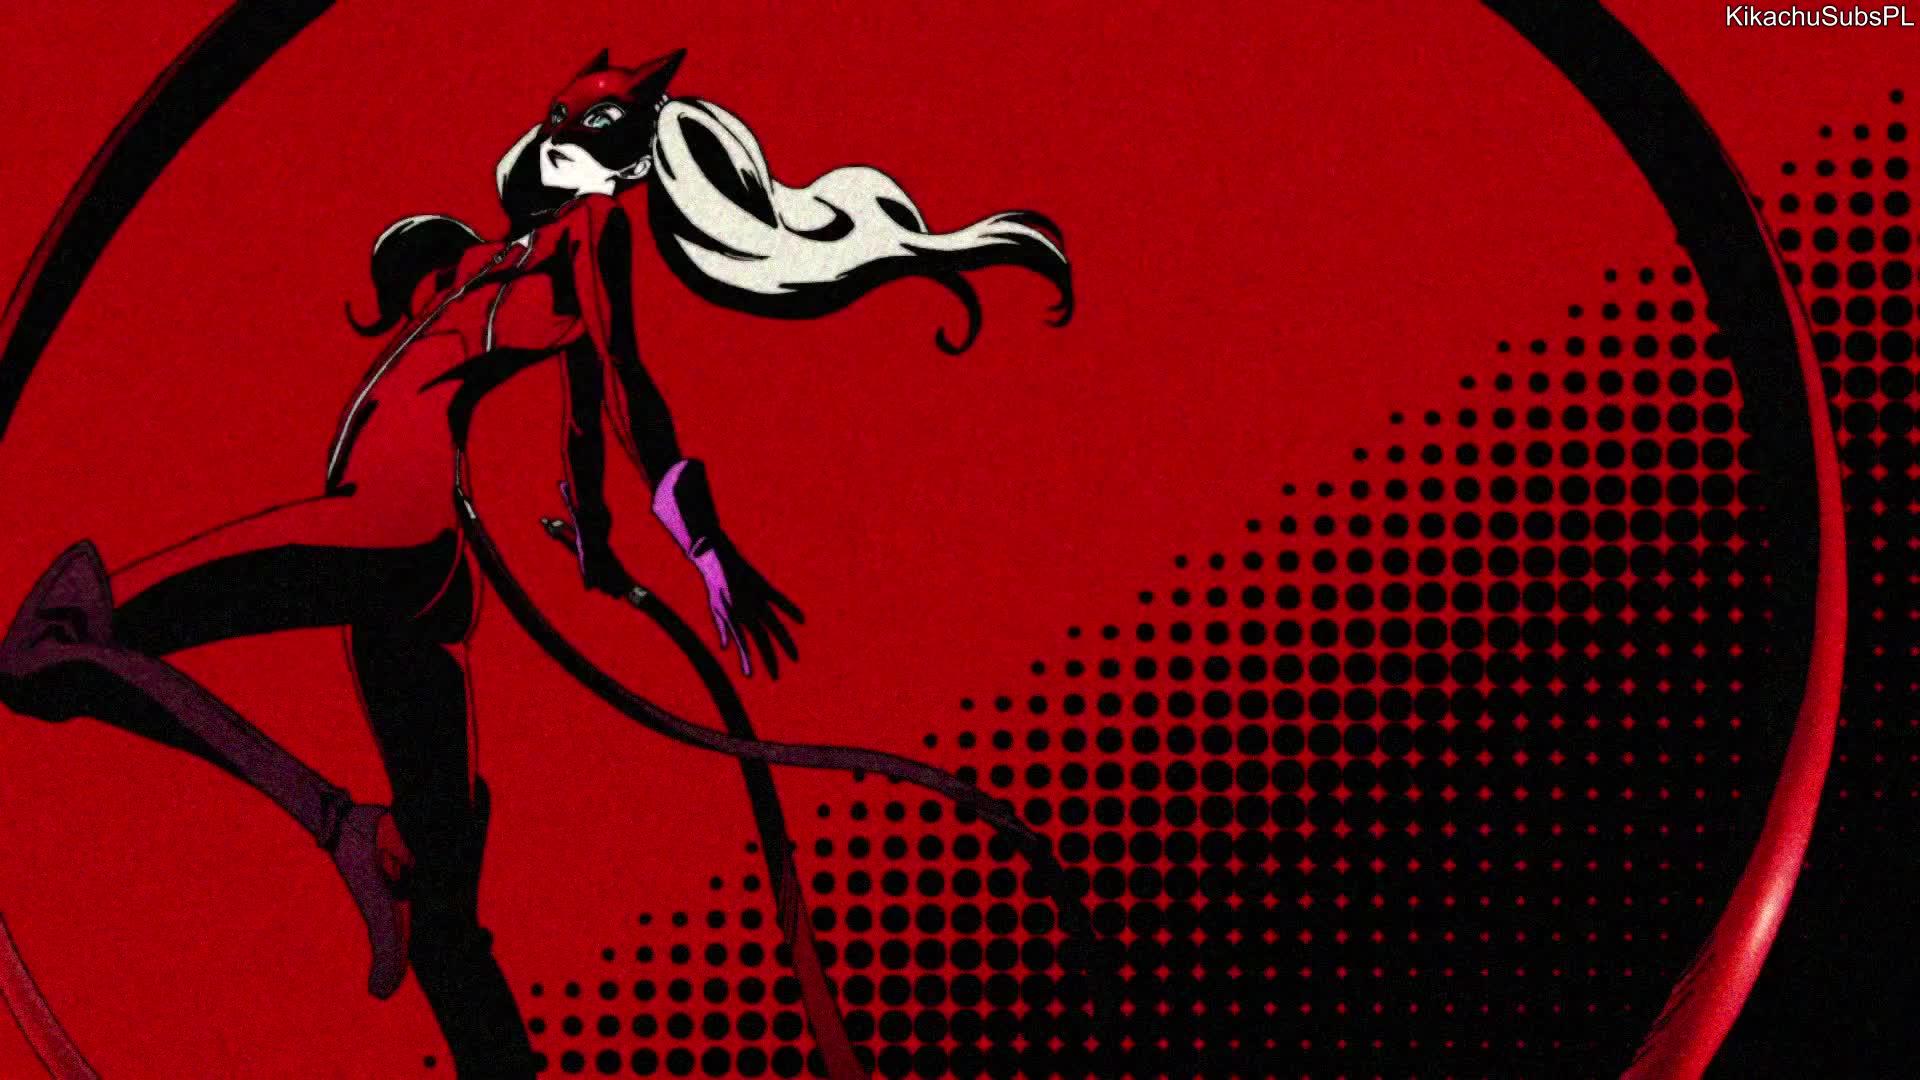 [KikachuSubsPL]Persona 5 The Animation 05 Napisy PL